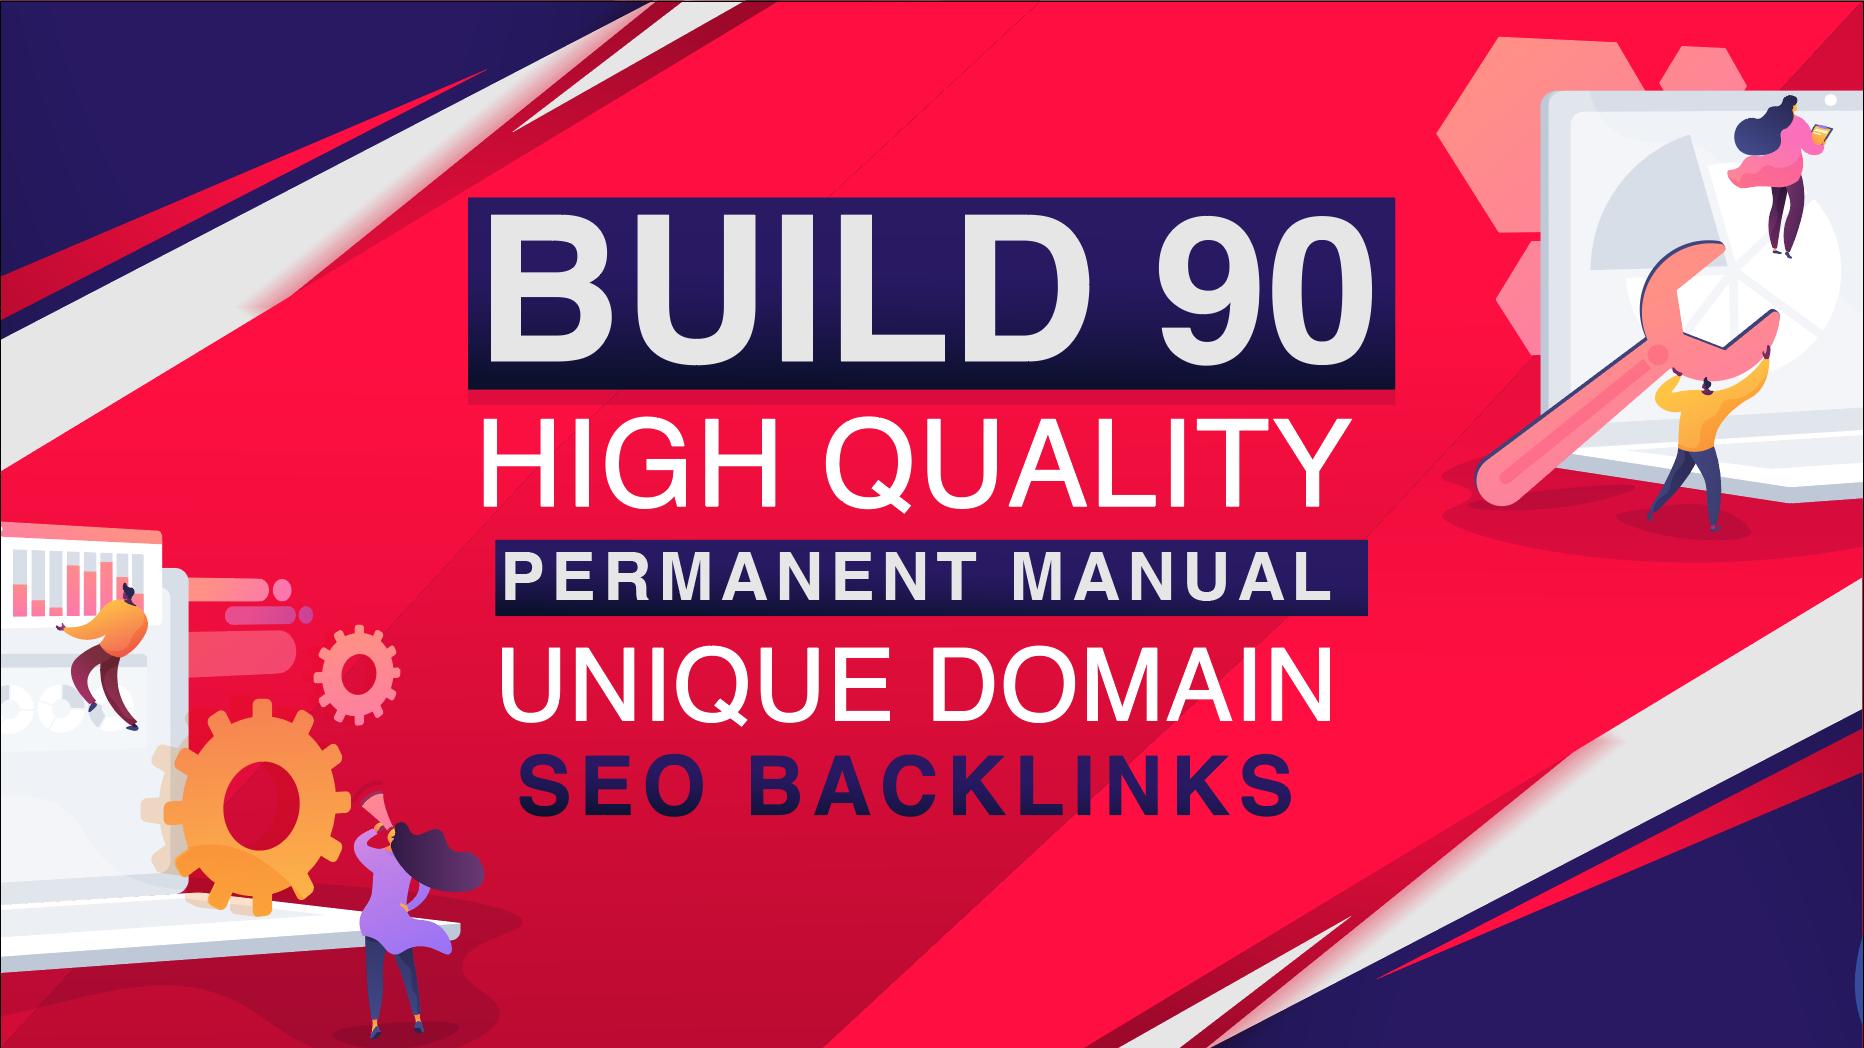 Build 90 High Quality Permanent Manual Unique Domain SEO Backlinks